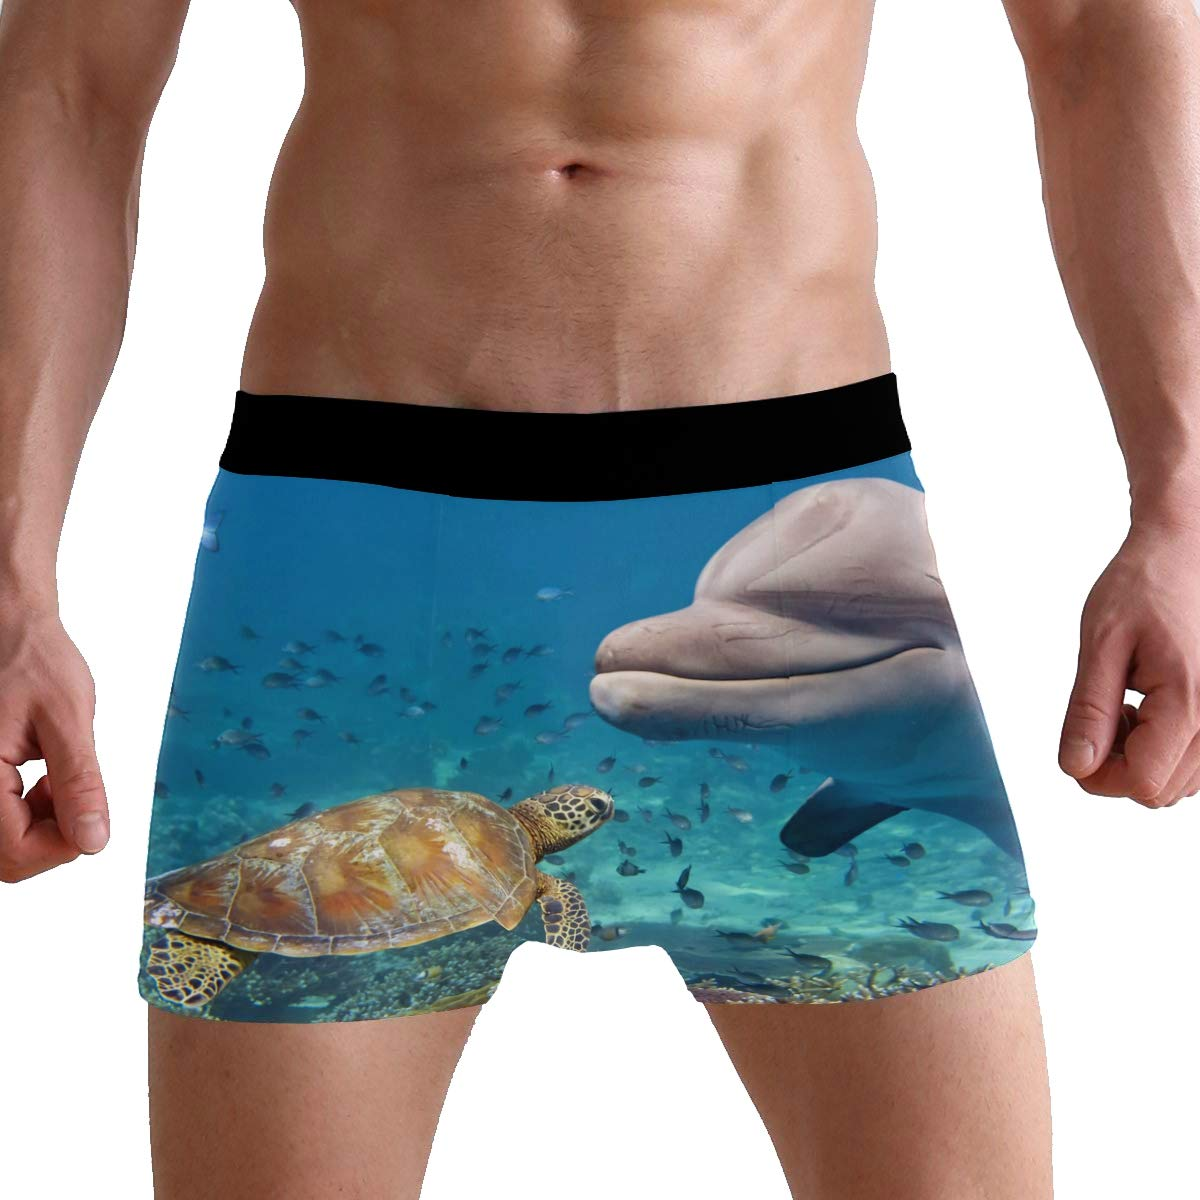 BETTKEN Mens Boxer Briefs Sea Animal Turtle Dolphin Short Underwear Soft Stretch Underpants for Men Boys S-XL